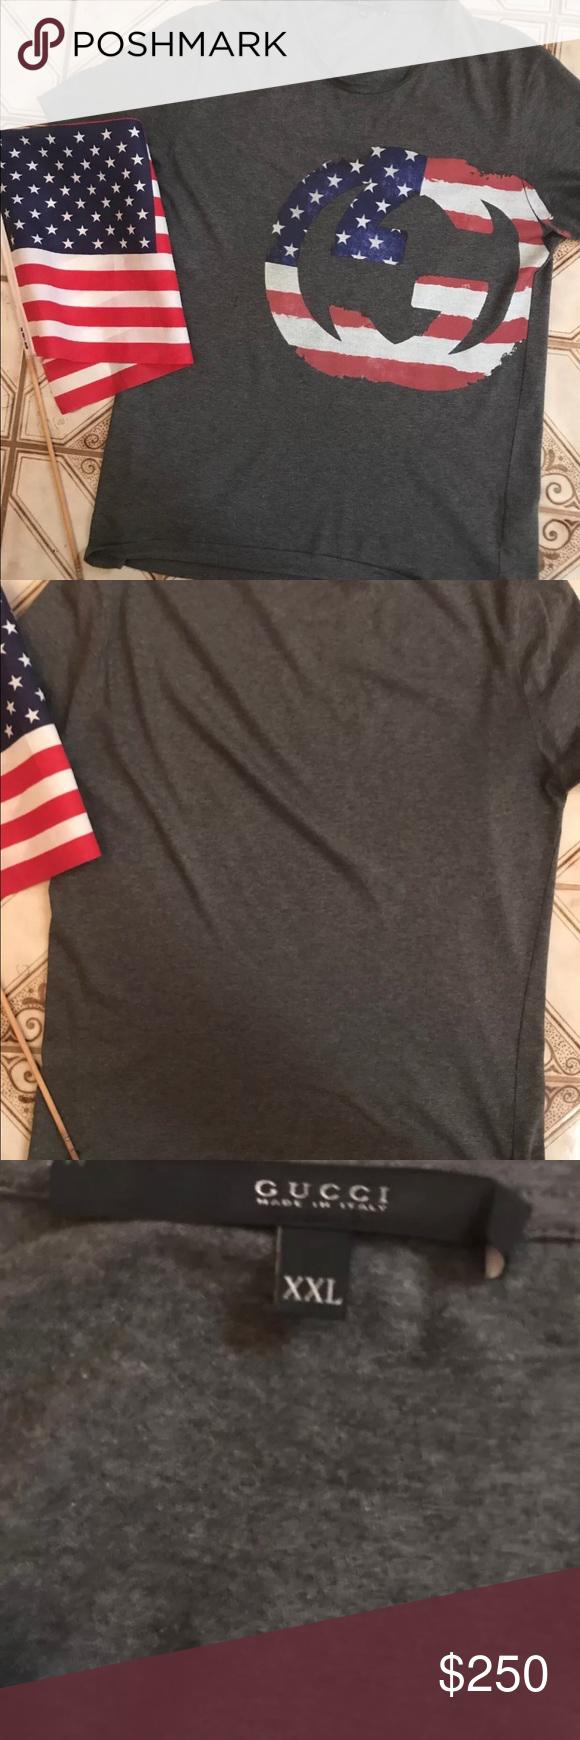 8d3b7dbec6e3d5 Gucci American Flag T Shirt (Vinatge) This is a Pre-Owned 100 ...